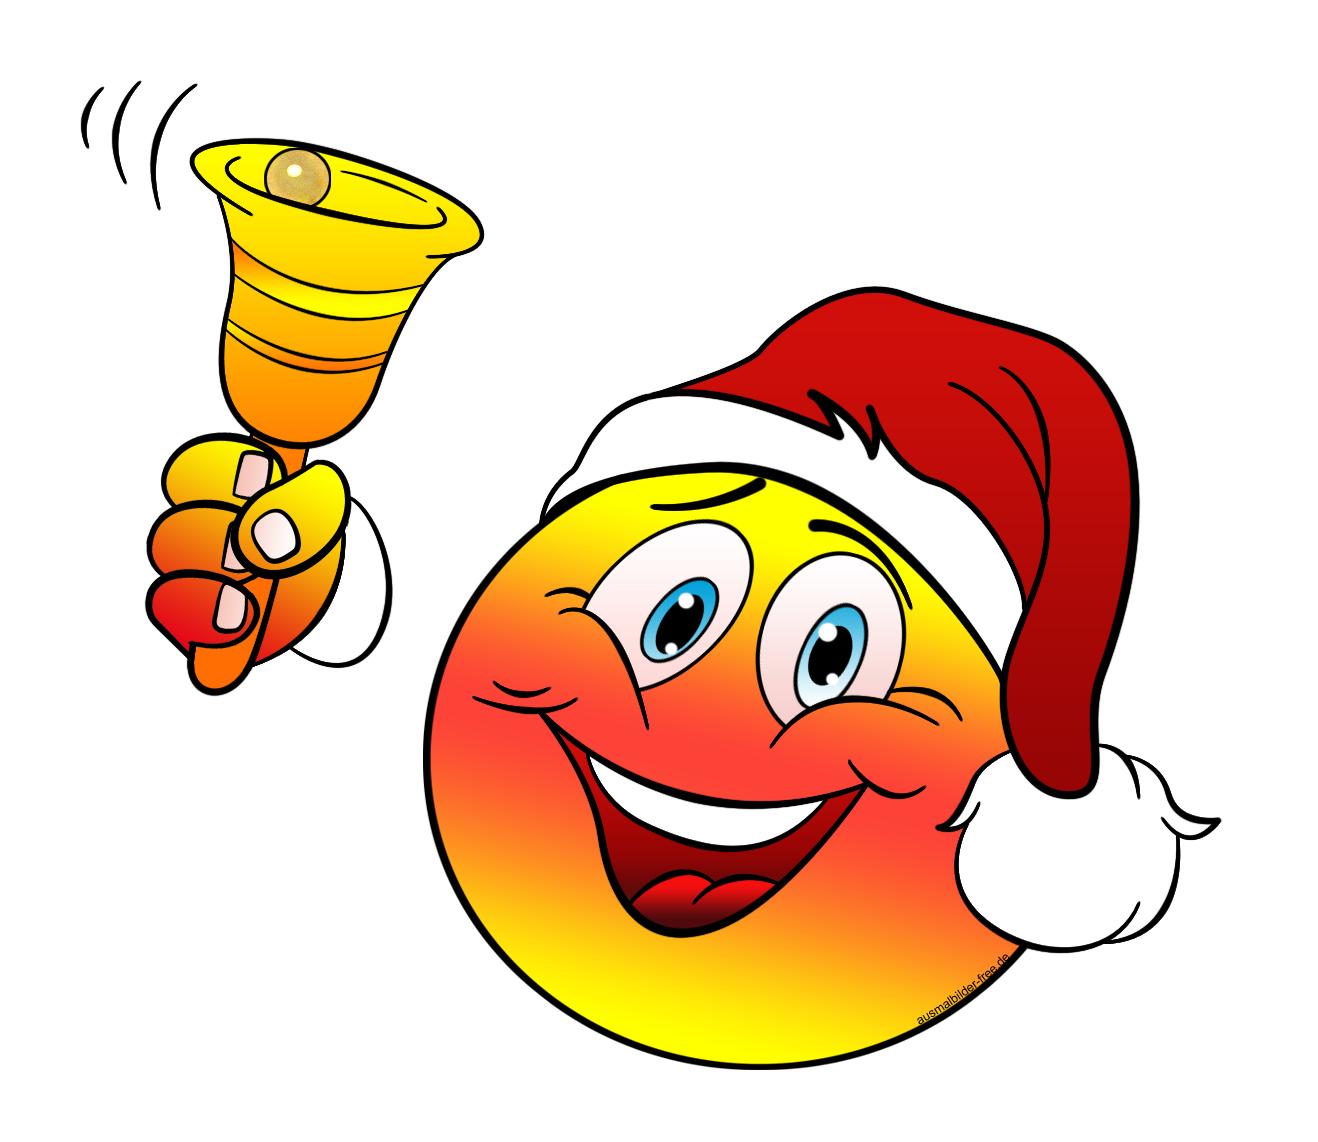 Gratis Ausmalbilder Winter : Http Ausmalbilder Free De Malvorlagen Smileys Winter Karikaturen